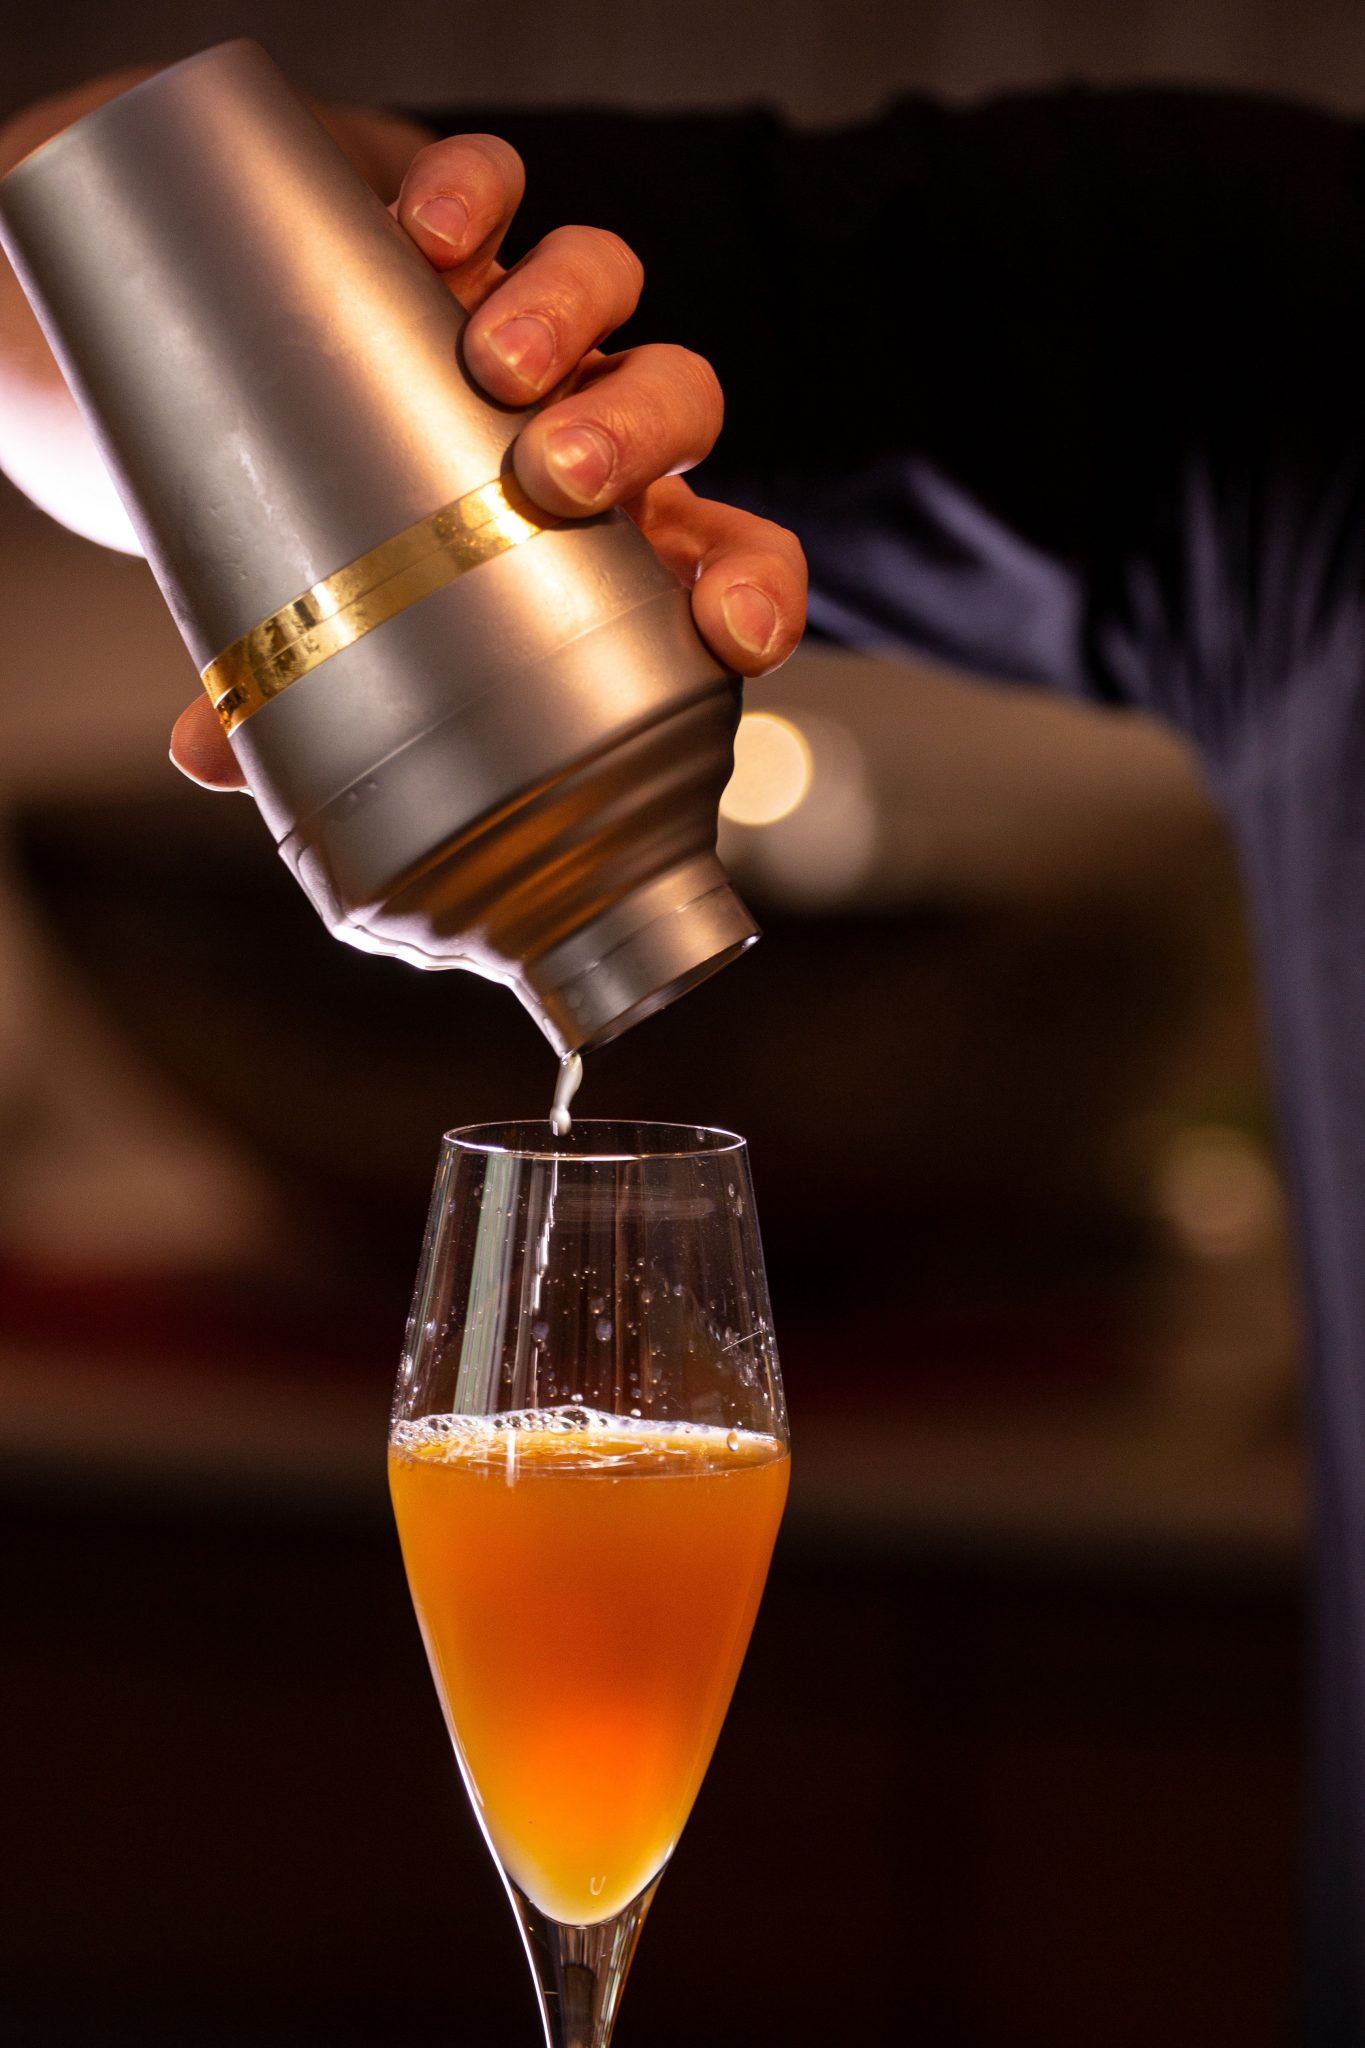 Copo alto com bebida a sair de shaker